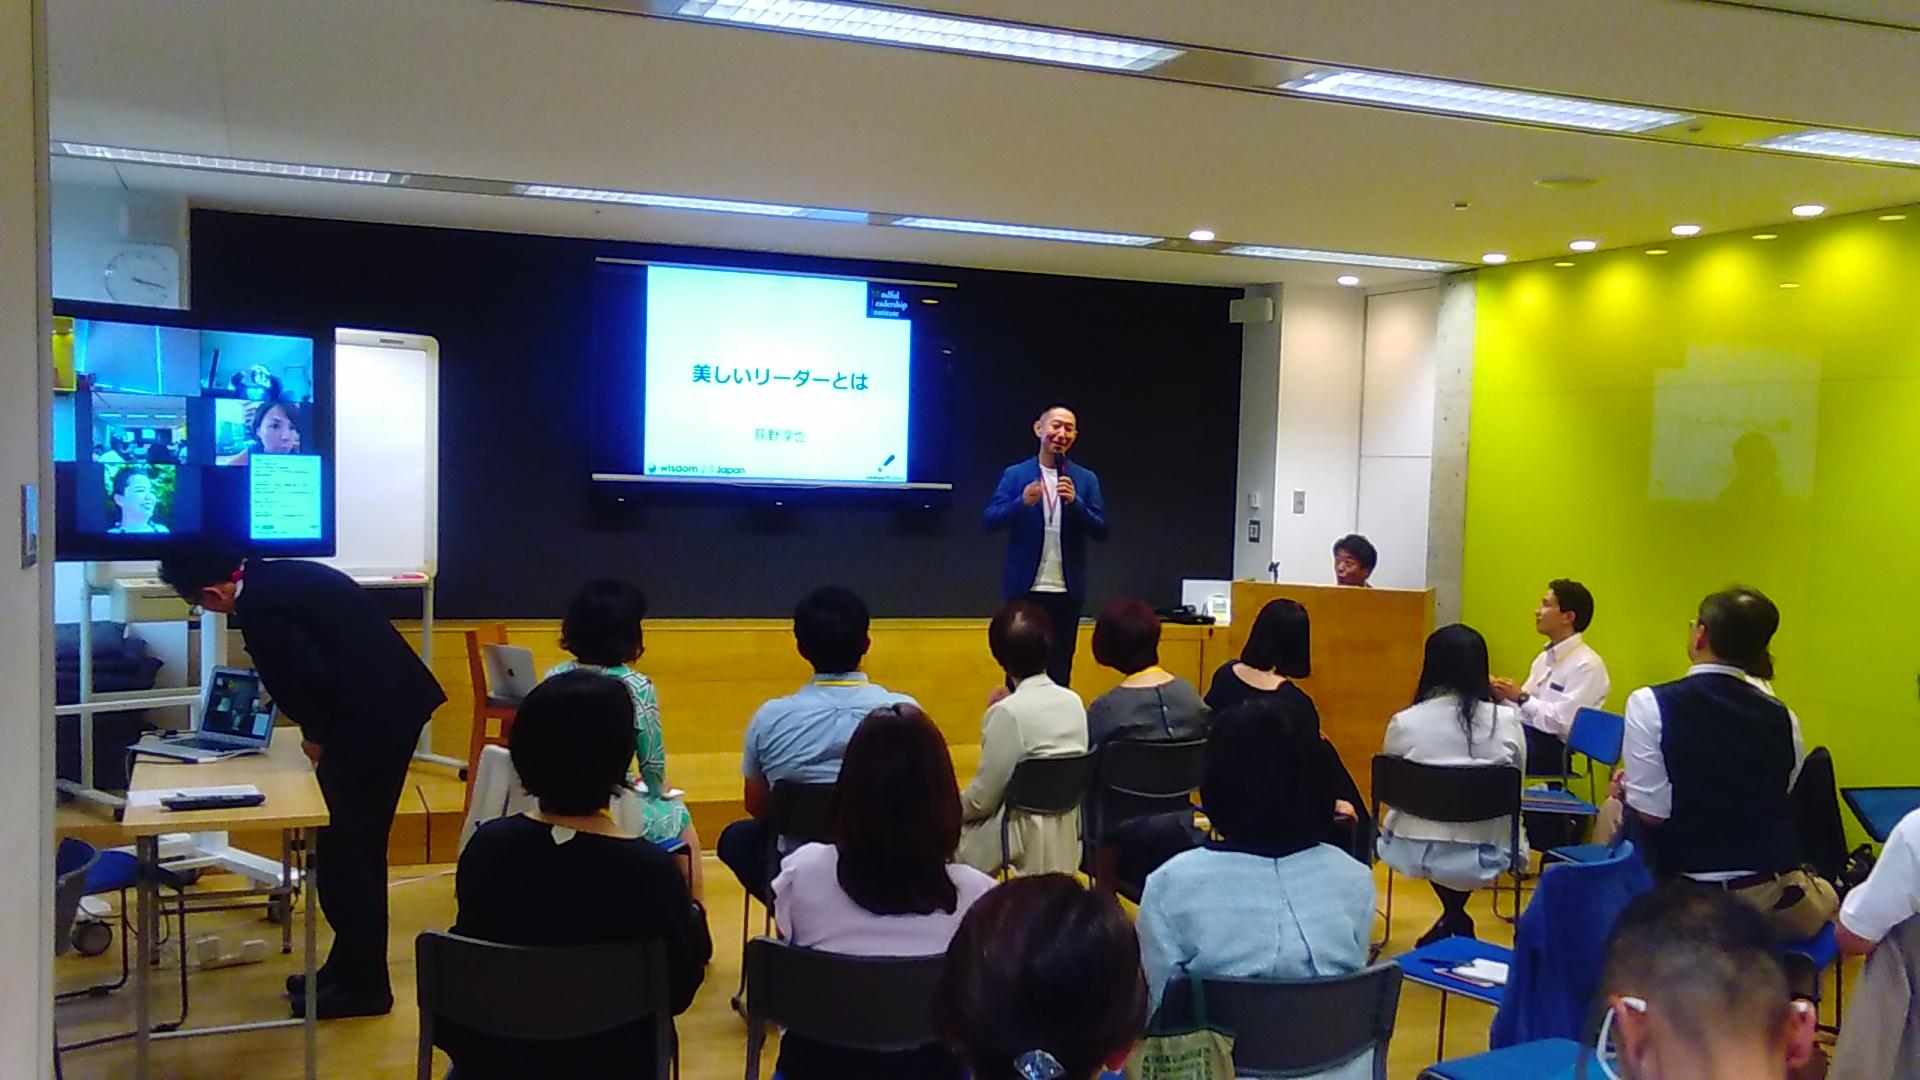 KIMG1314 - 100年続く美しい会社プロジェクト ブラッシュアップ講座開催